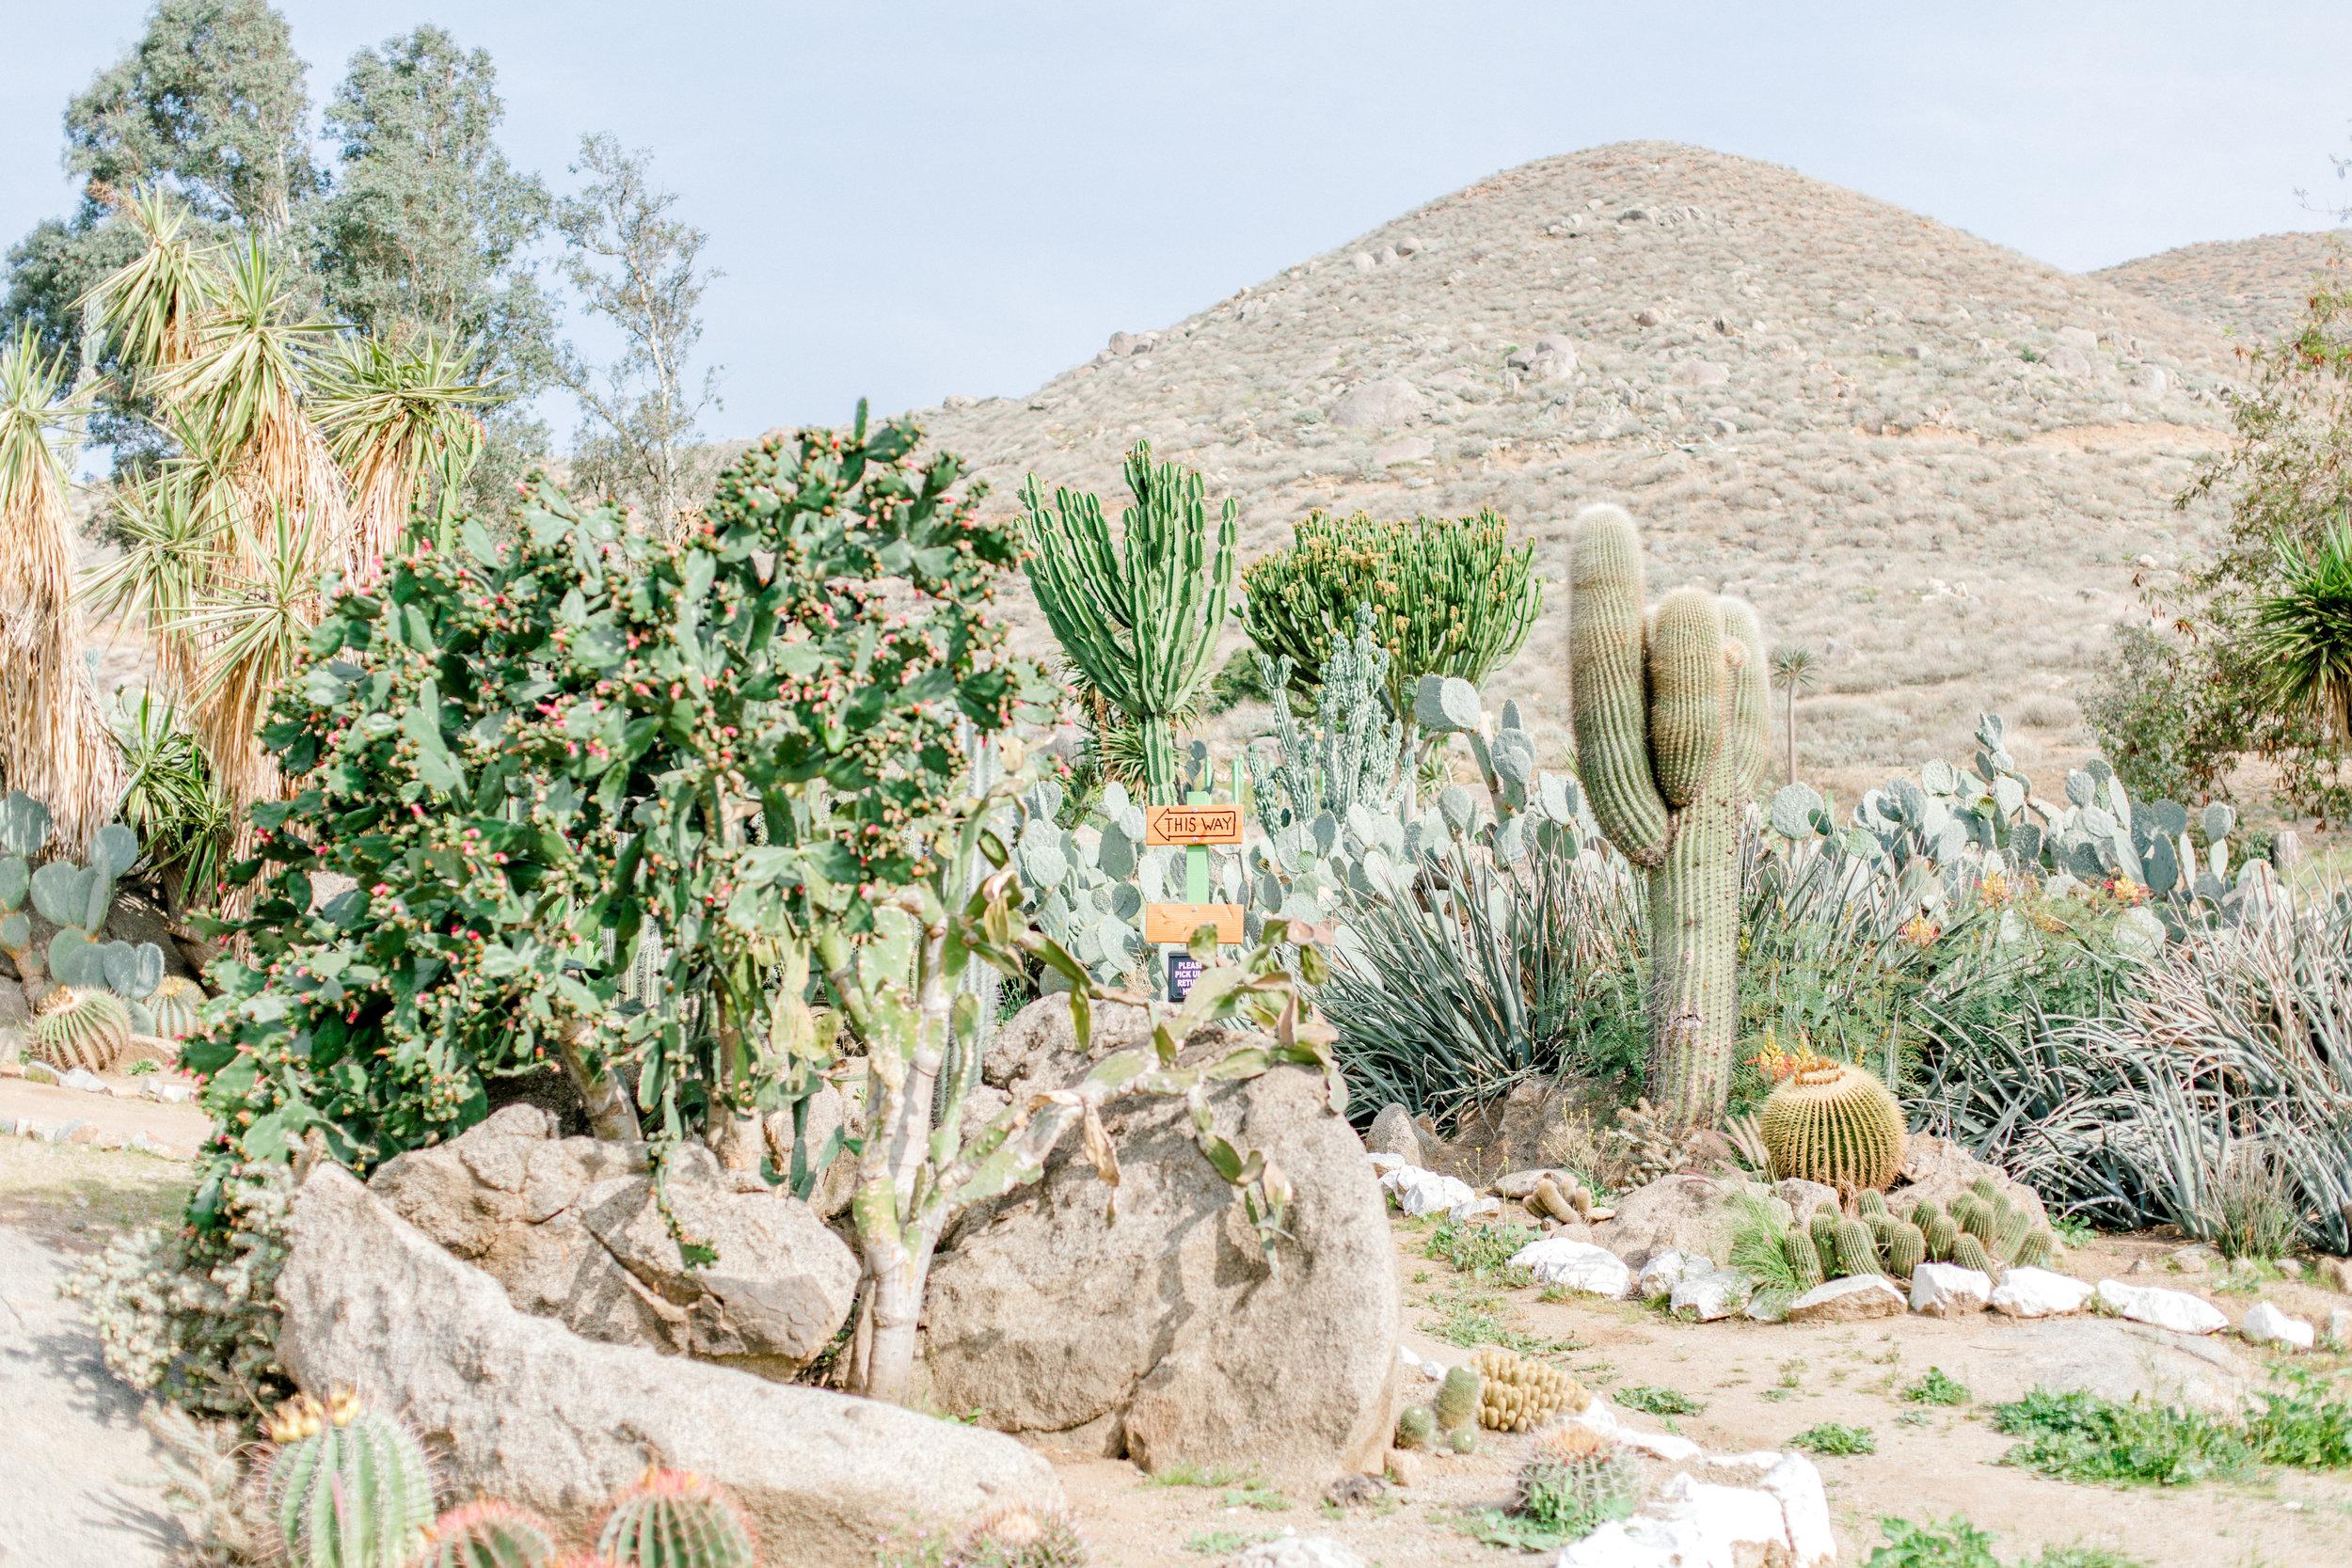 Jessica Sgubin Photography Atlanta Portrait photographer los angeles la salvation mountain greenhouse cactus garden moorten botanical garden cabazon dinosaurs santa monica joshua tree-1-3.jpg